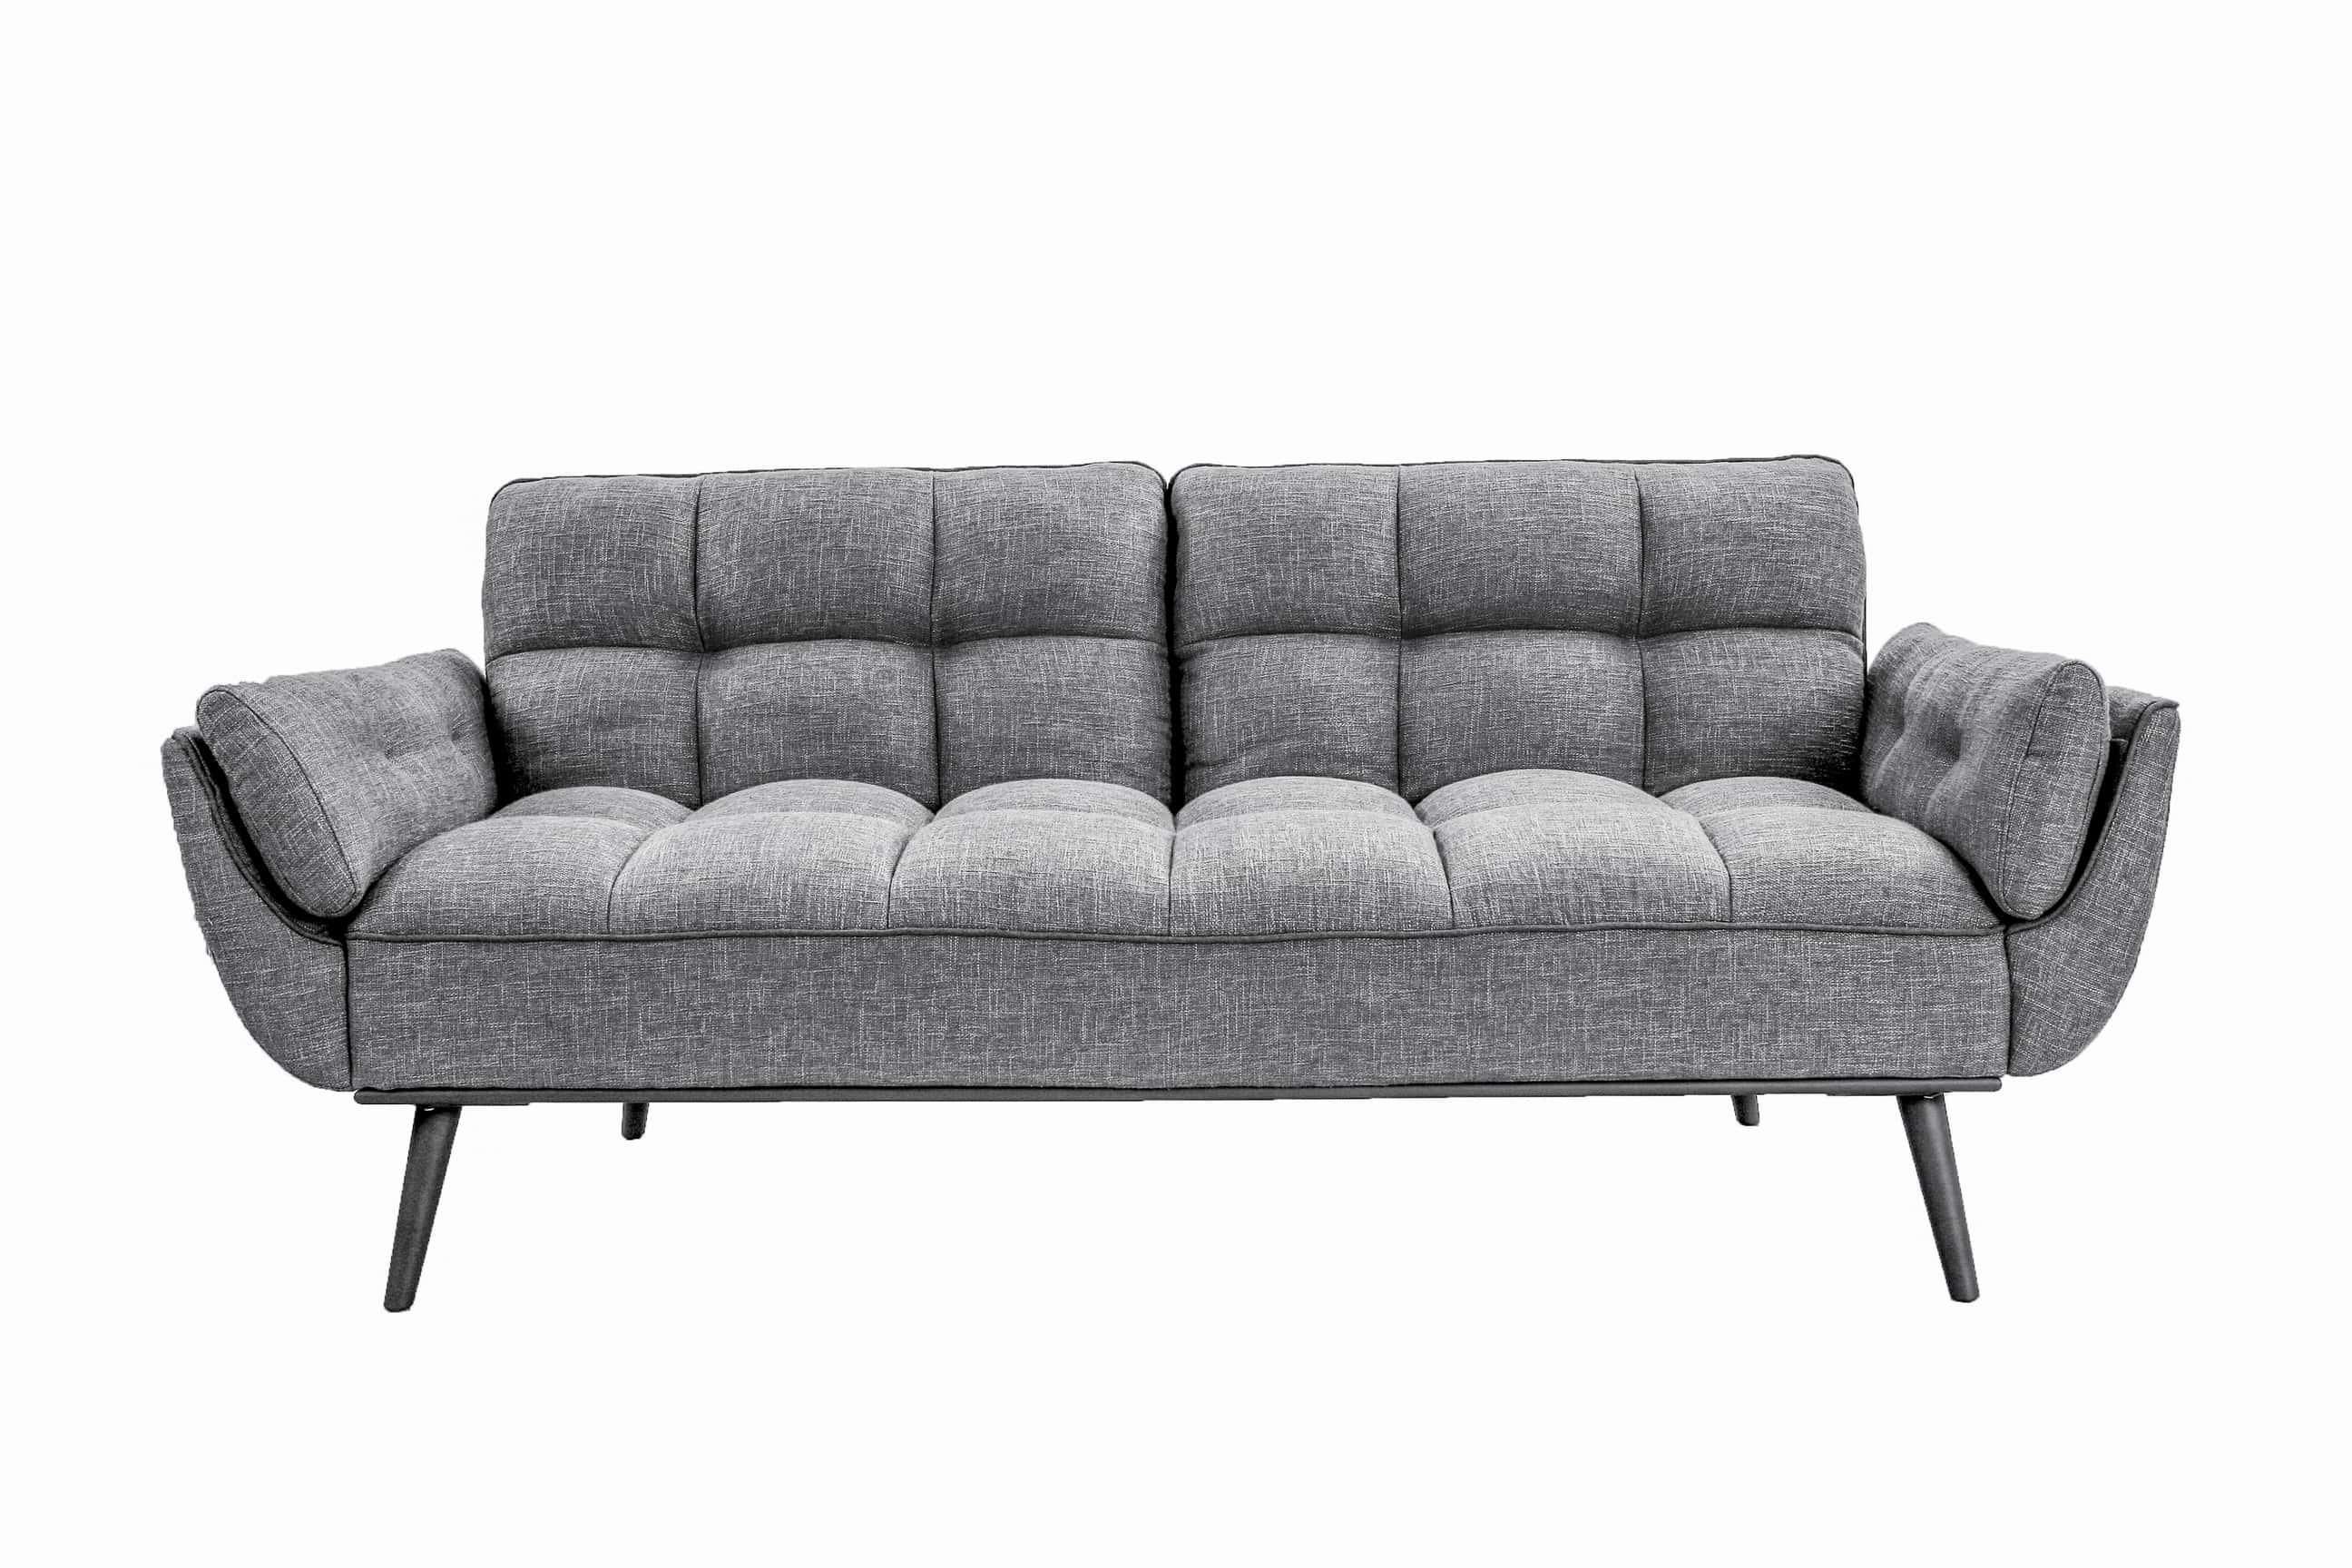 Candice Convertible Sofa Dark Gray by Serta / Lifestyle